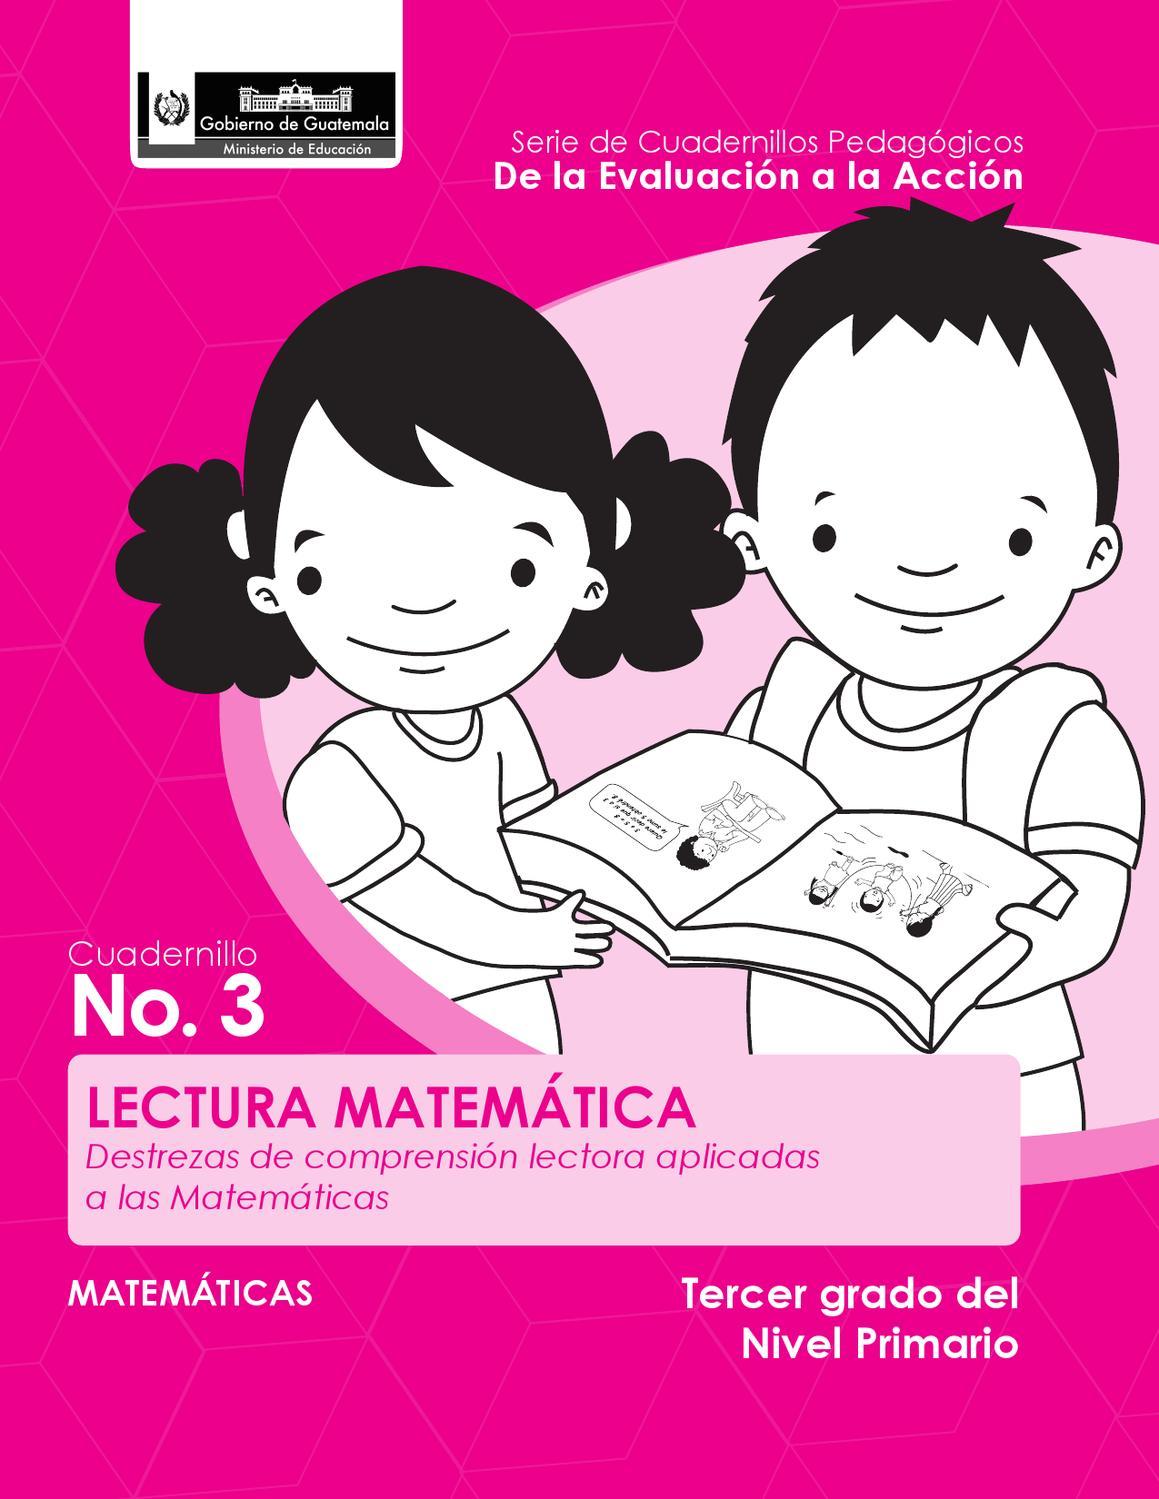 Lectura Matemática by DIGEDUCA MINEDUC - issuu